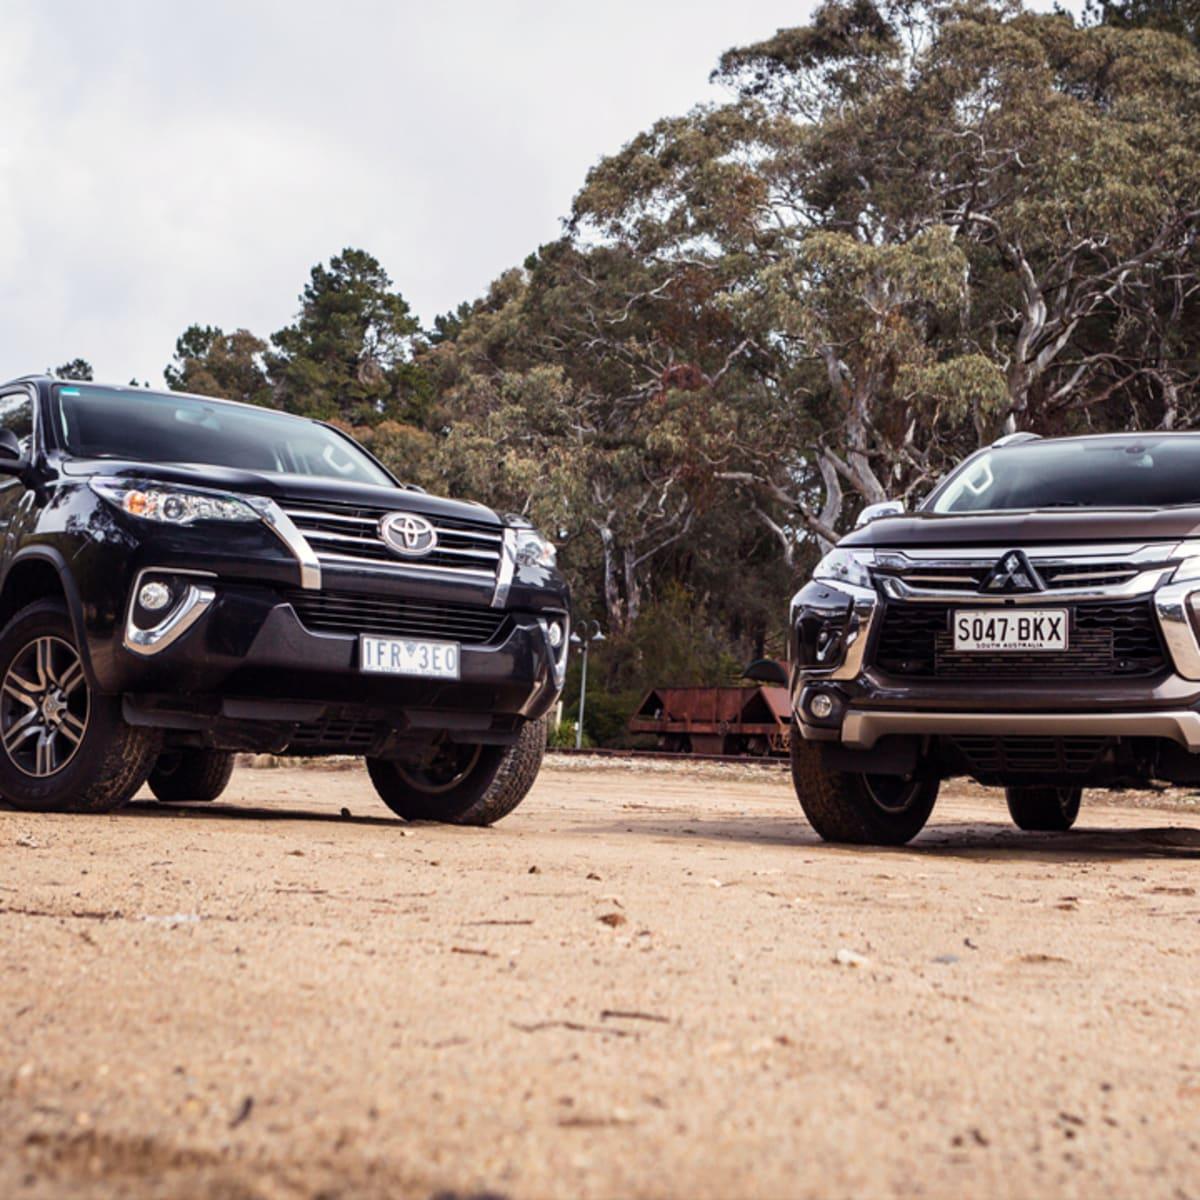 2016 Toyota Fortuner GXL v Mitsubishi Pajero Sport Exceed